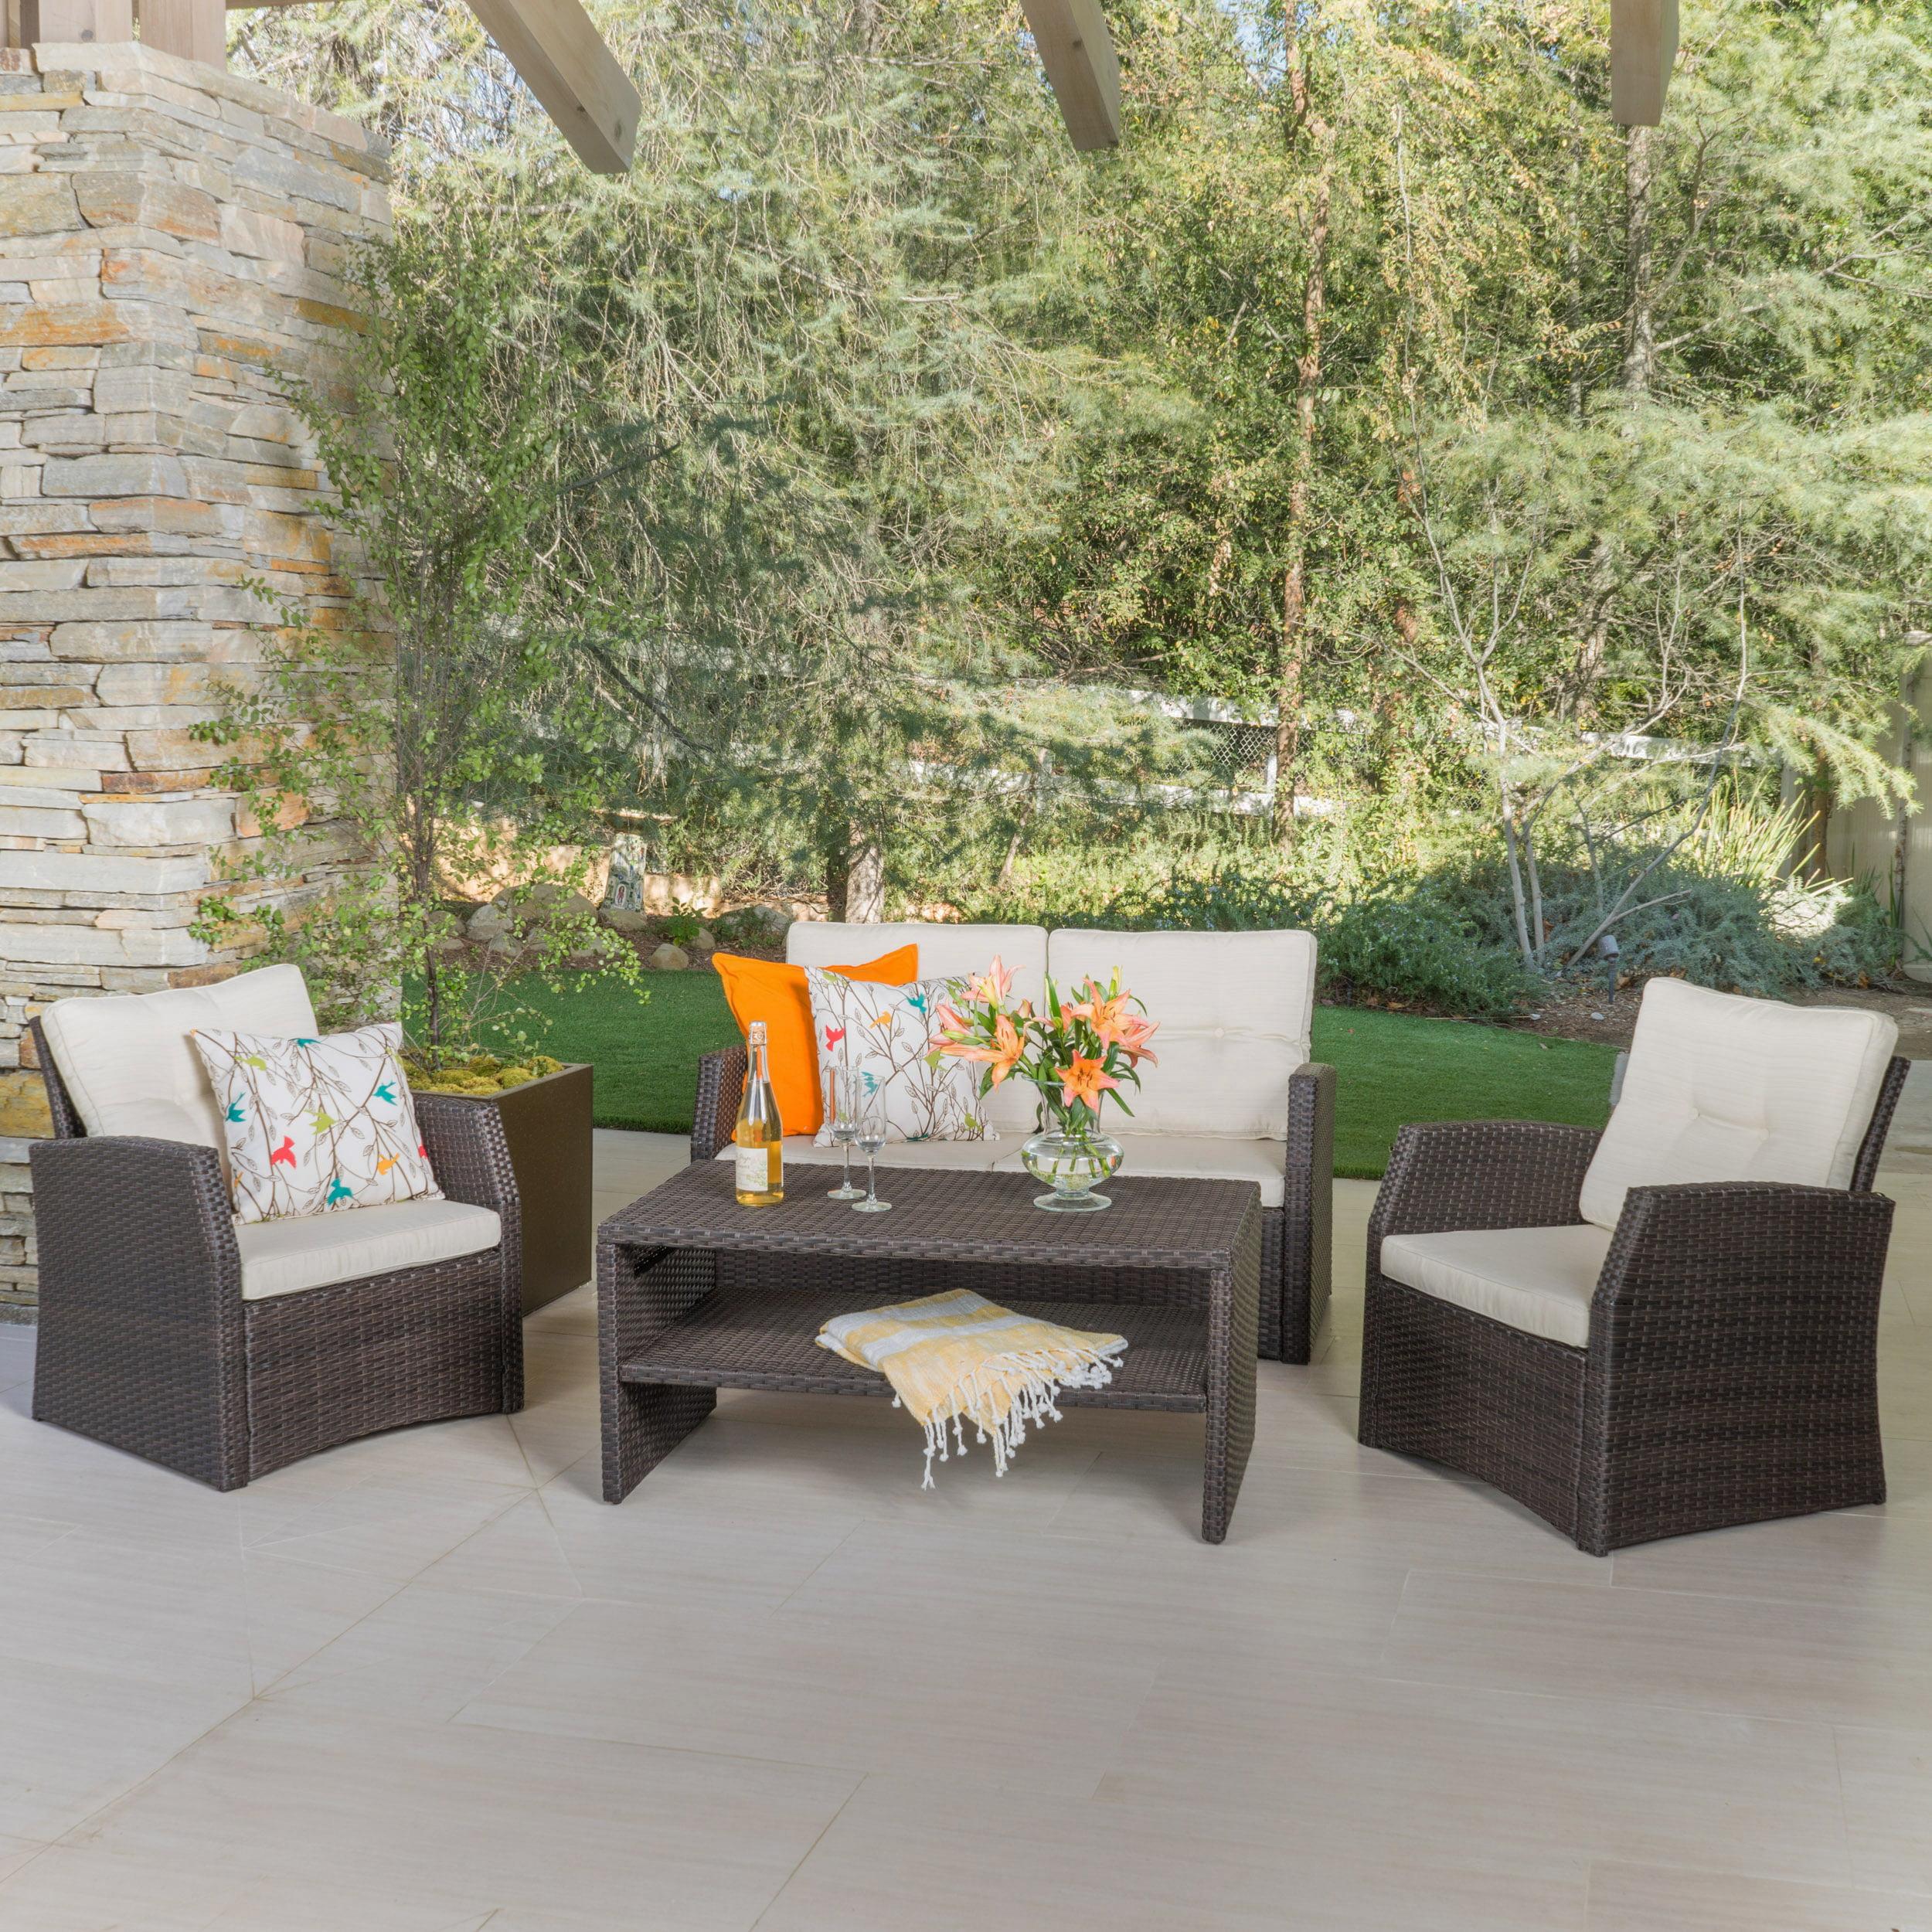 Grace Outdoor 4-piece Wicker Seating Set, Brown